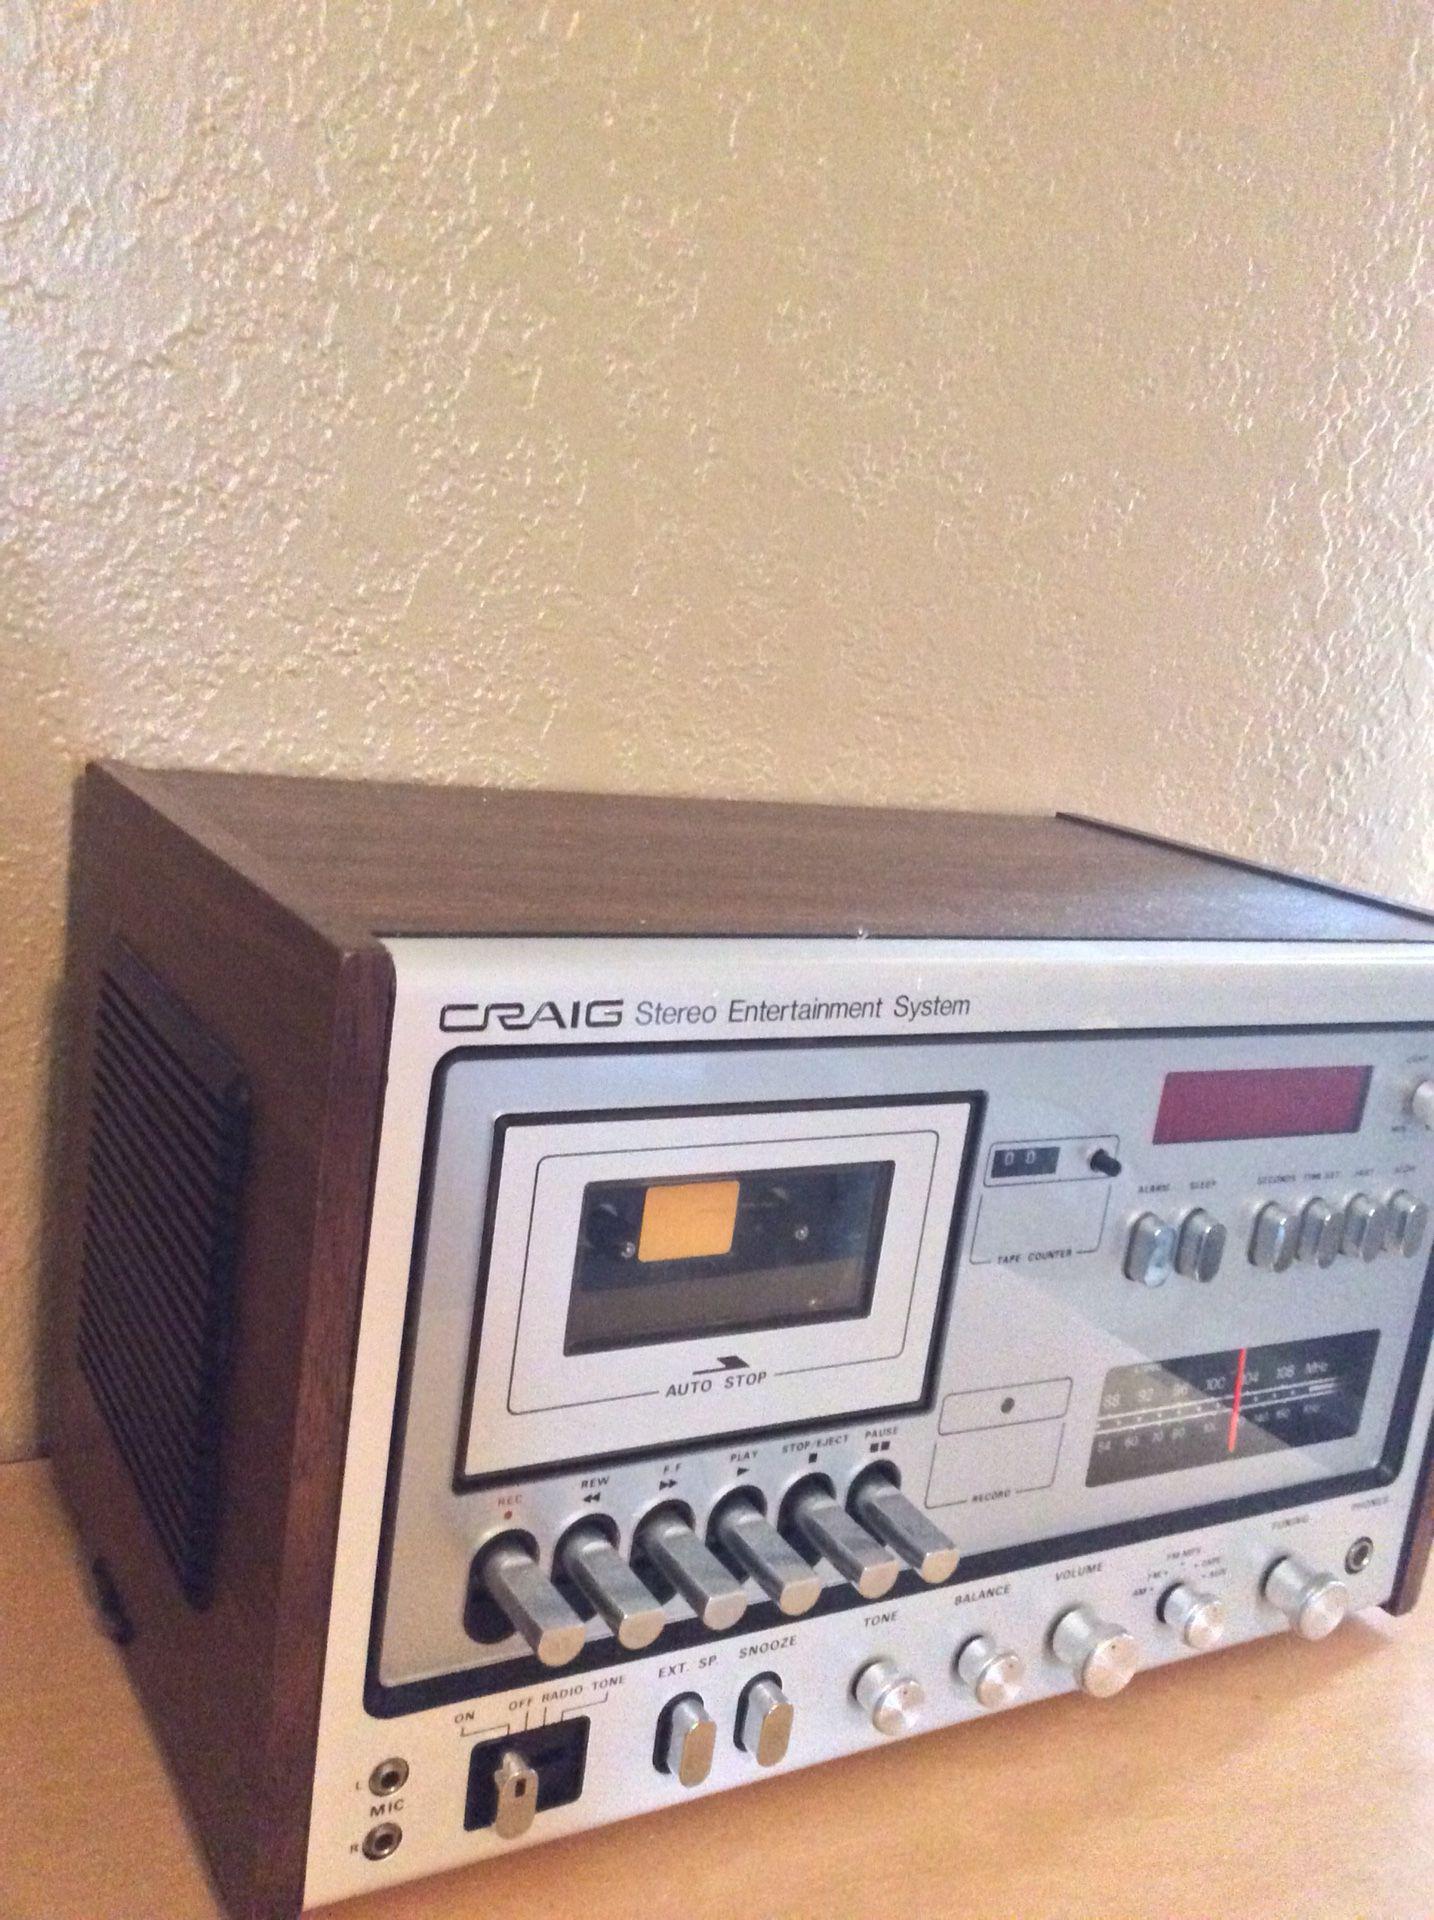 Vintage Craig stereo/entertainment system